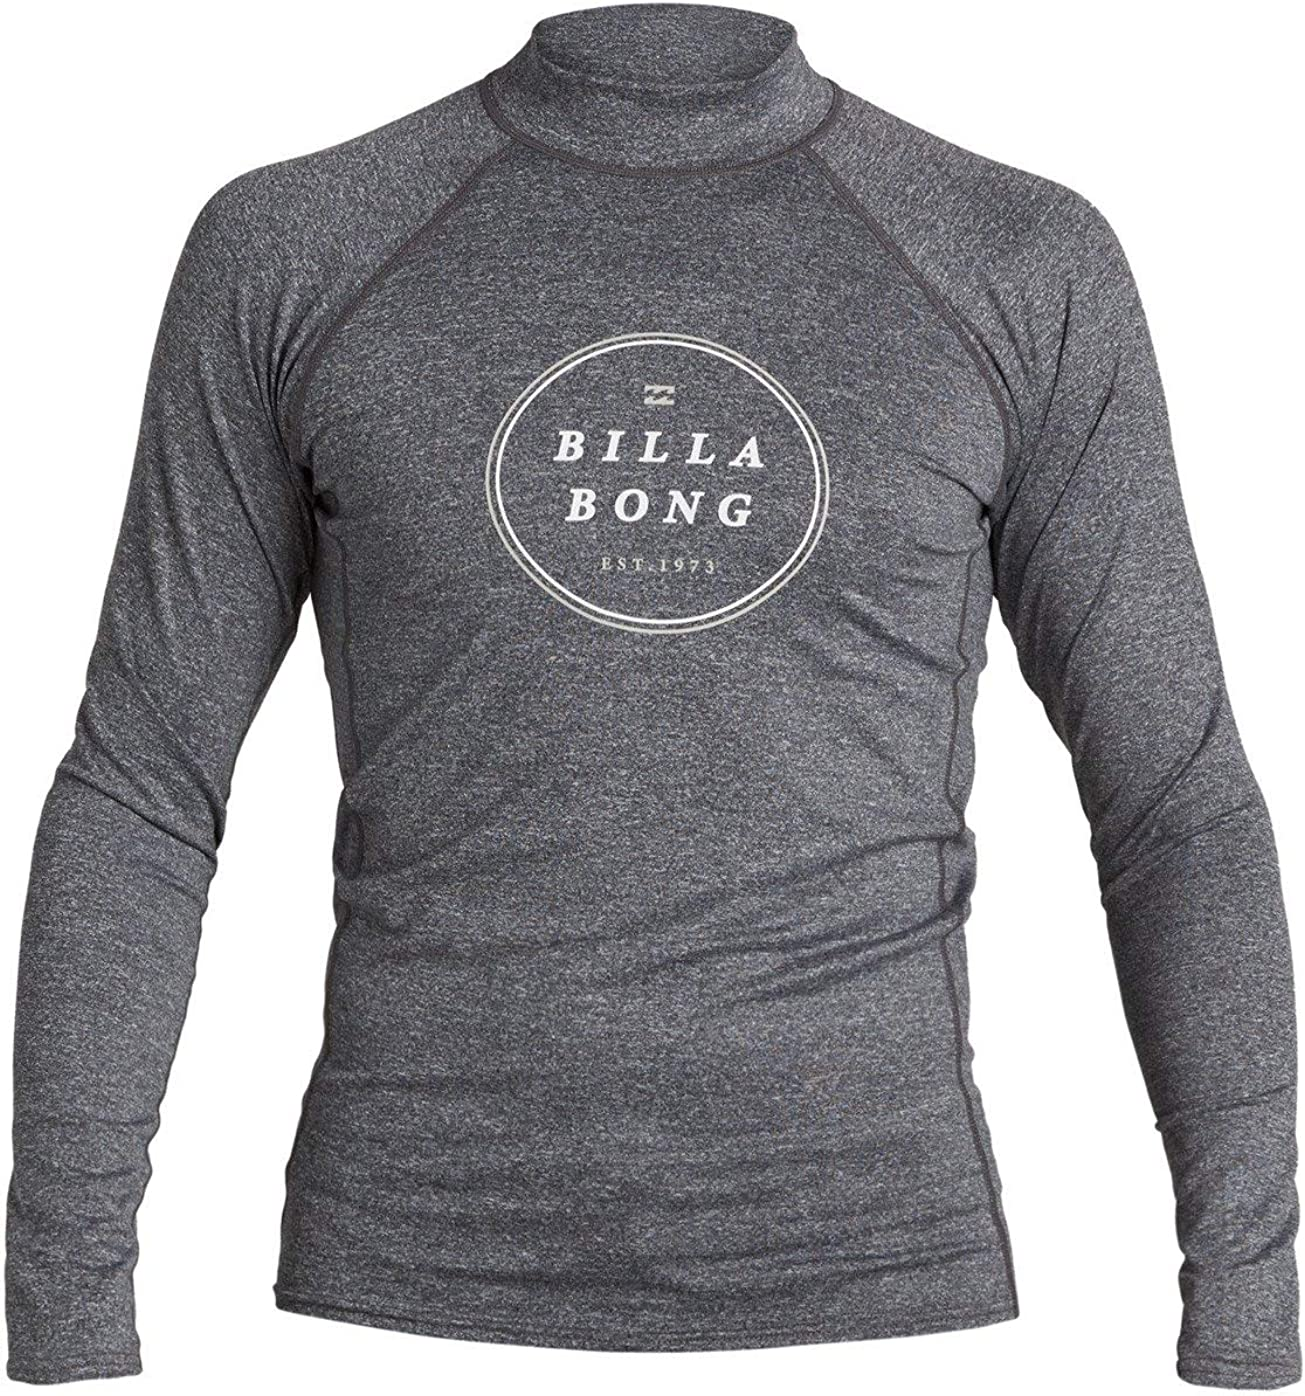 Billabong Men's Rotor Performance Fit Long Sleeve Rashguard